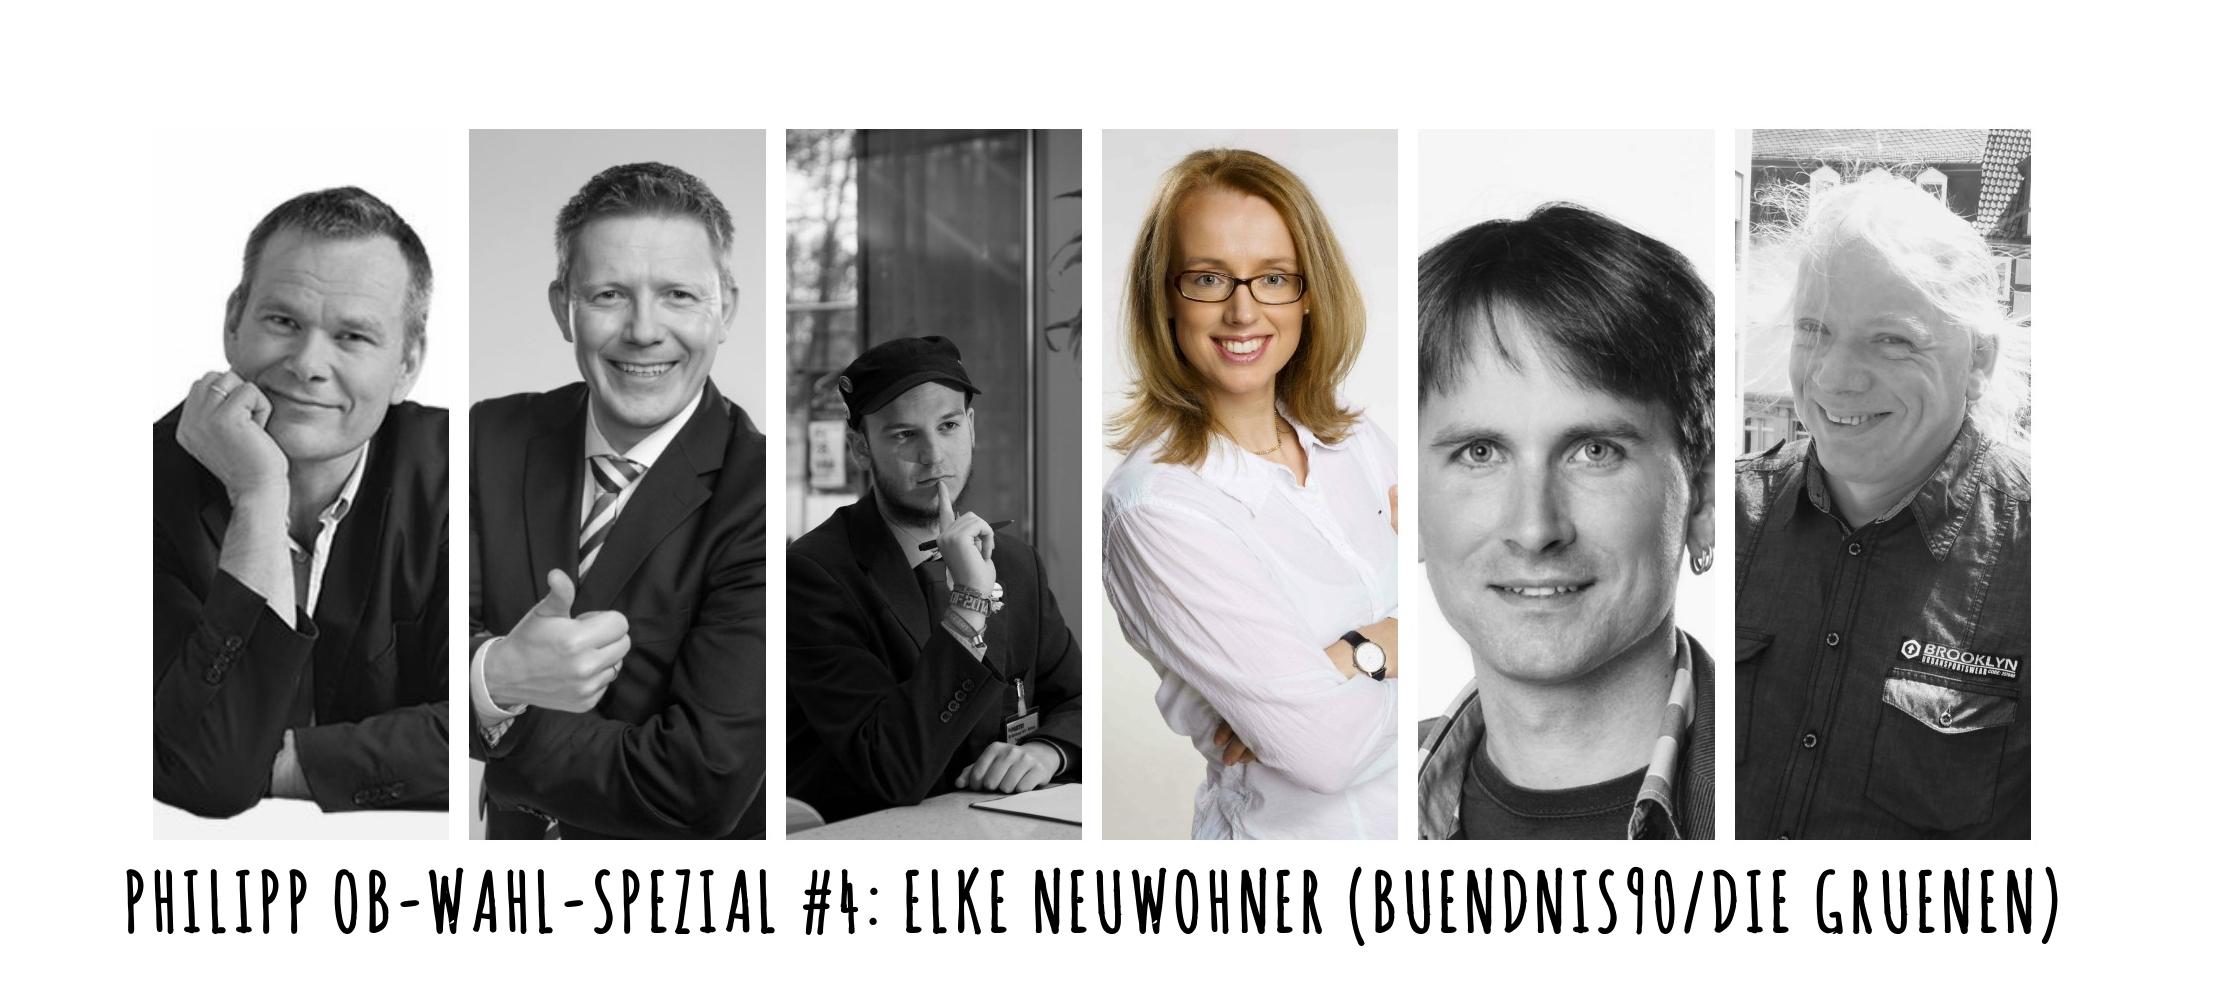 OB-Wahl-2015-Spezial #4: Elke Neuwohner (Bündnis 90/Die Grünen)